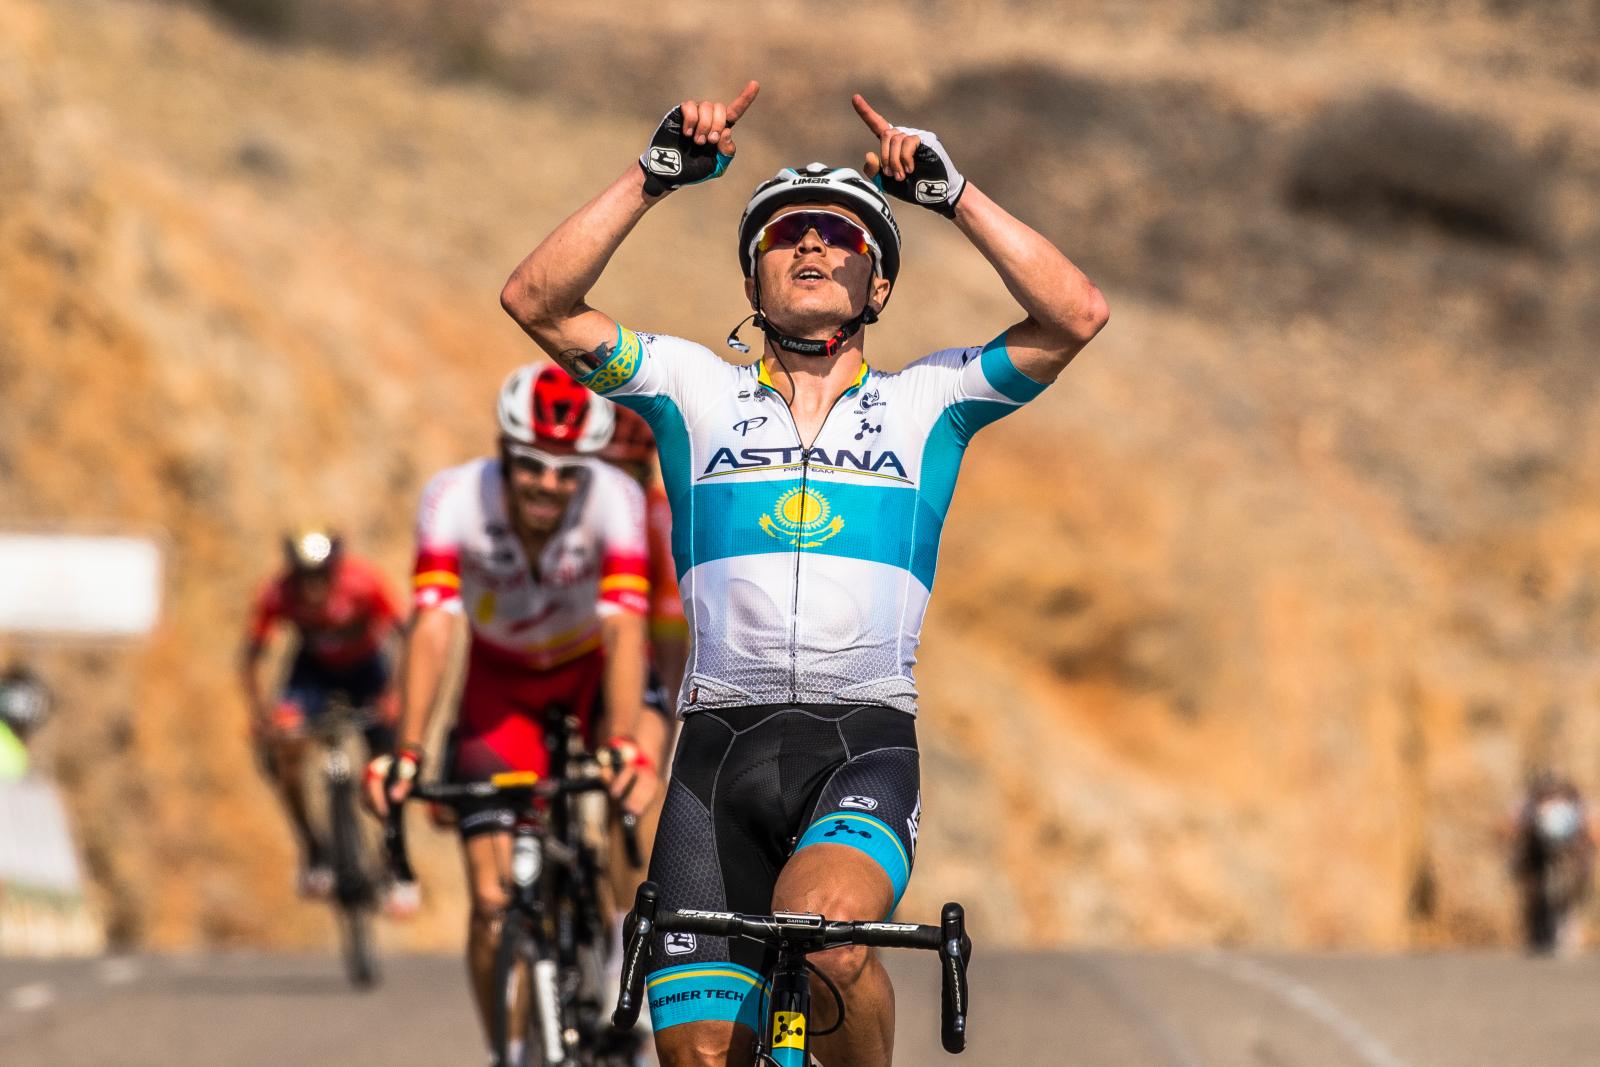 18/02/2019 - Tour of Oman - Stage 2 - Shati Al Qurum - Qurayyat - Alexey Lutsenko (Astana Pro Team). Credit: ASO/Kare Dehlie Thorstad